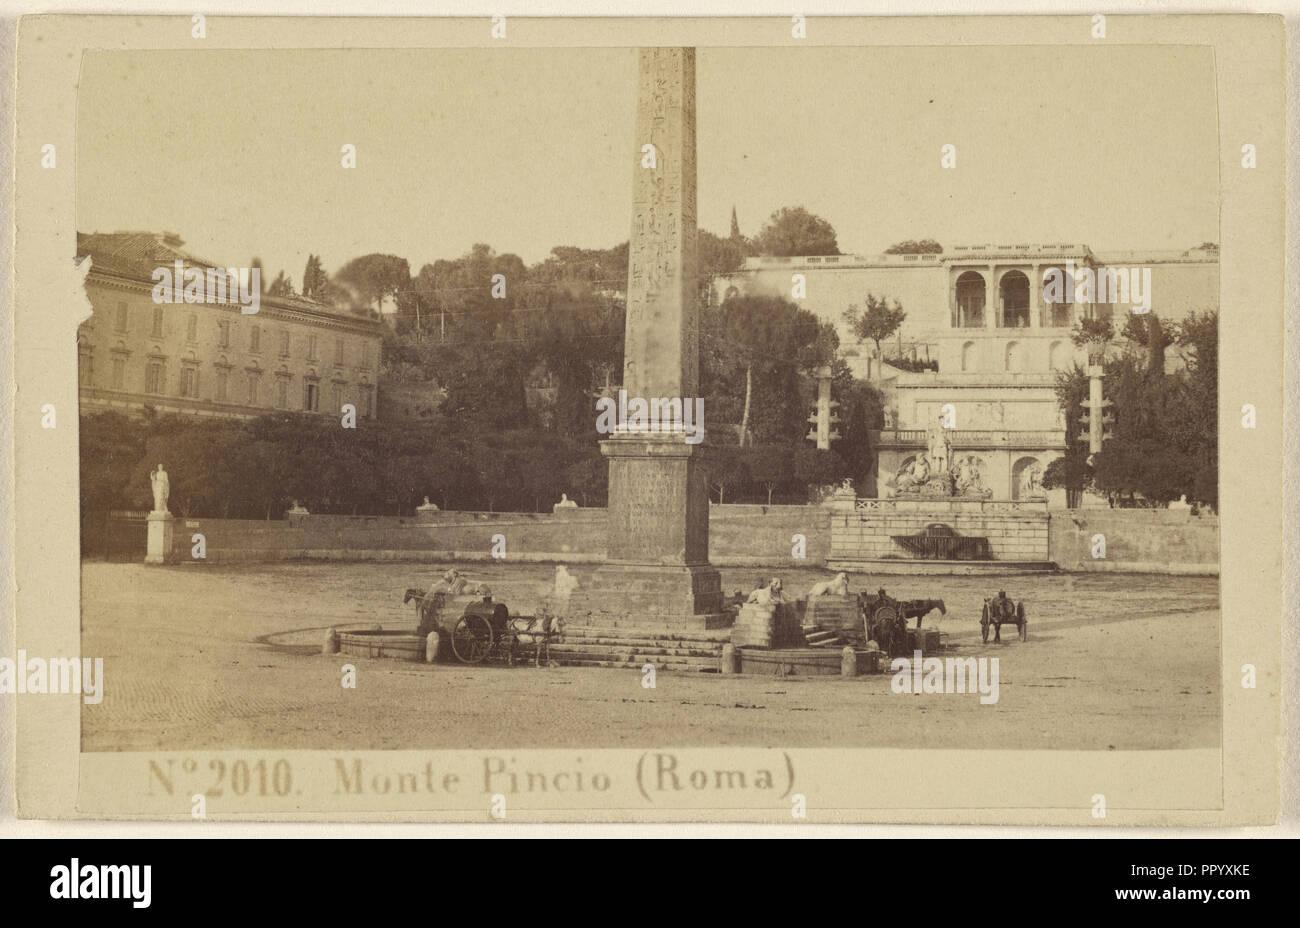 Monte Pincio, Roma, Sommer & Behles, Italian, 1867 - 1874, 1870 - 1875; Albumen silver print - Stock Image